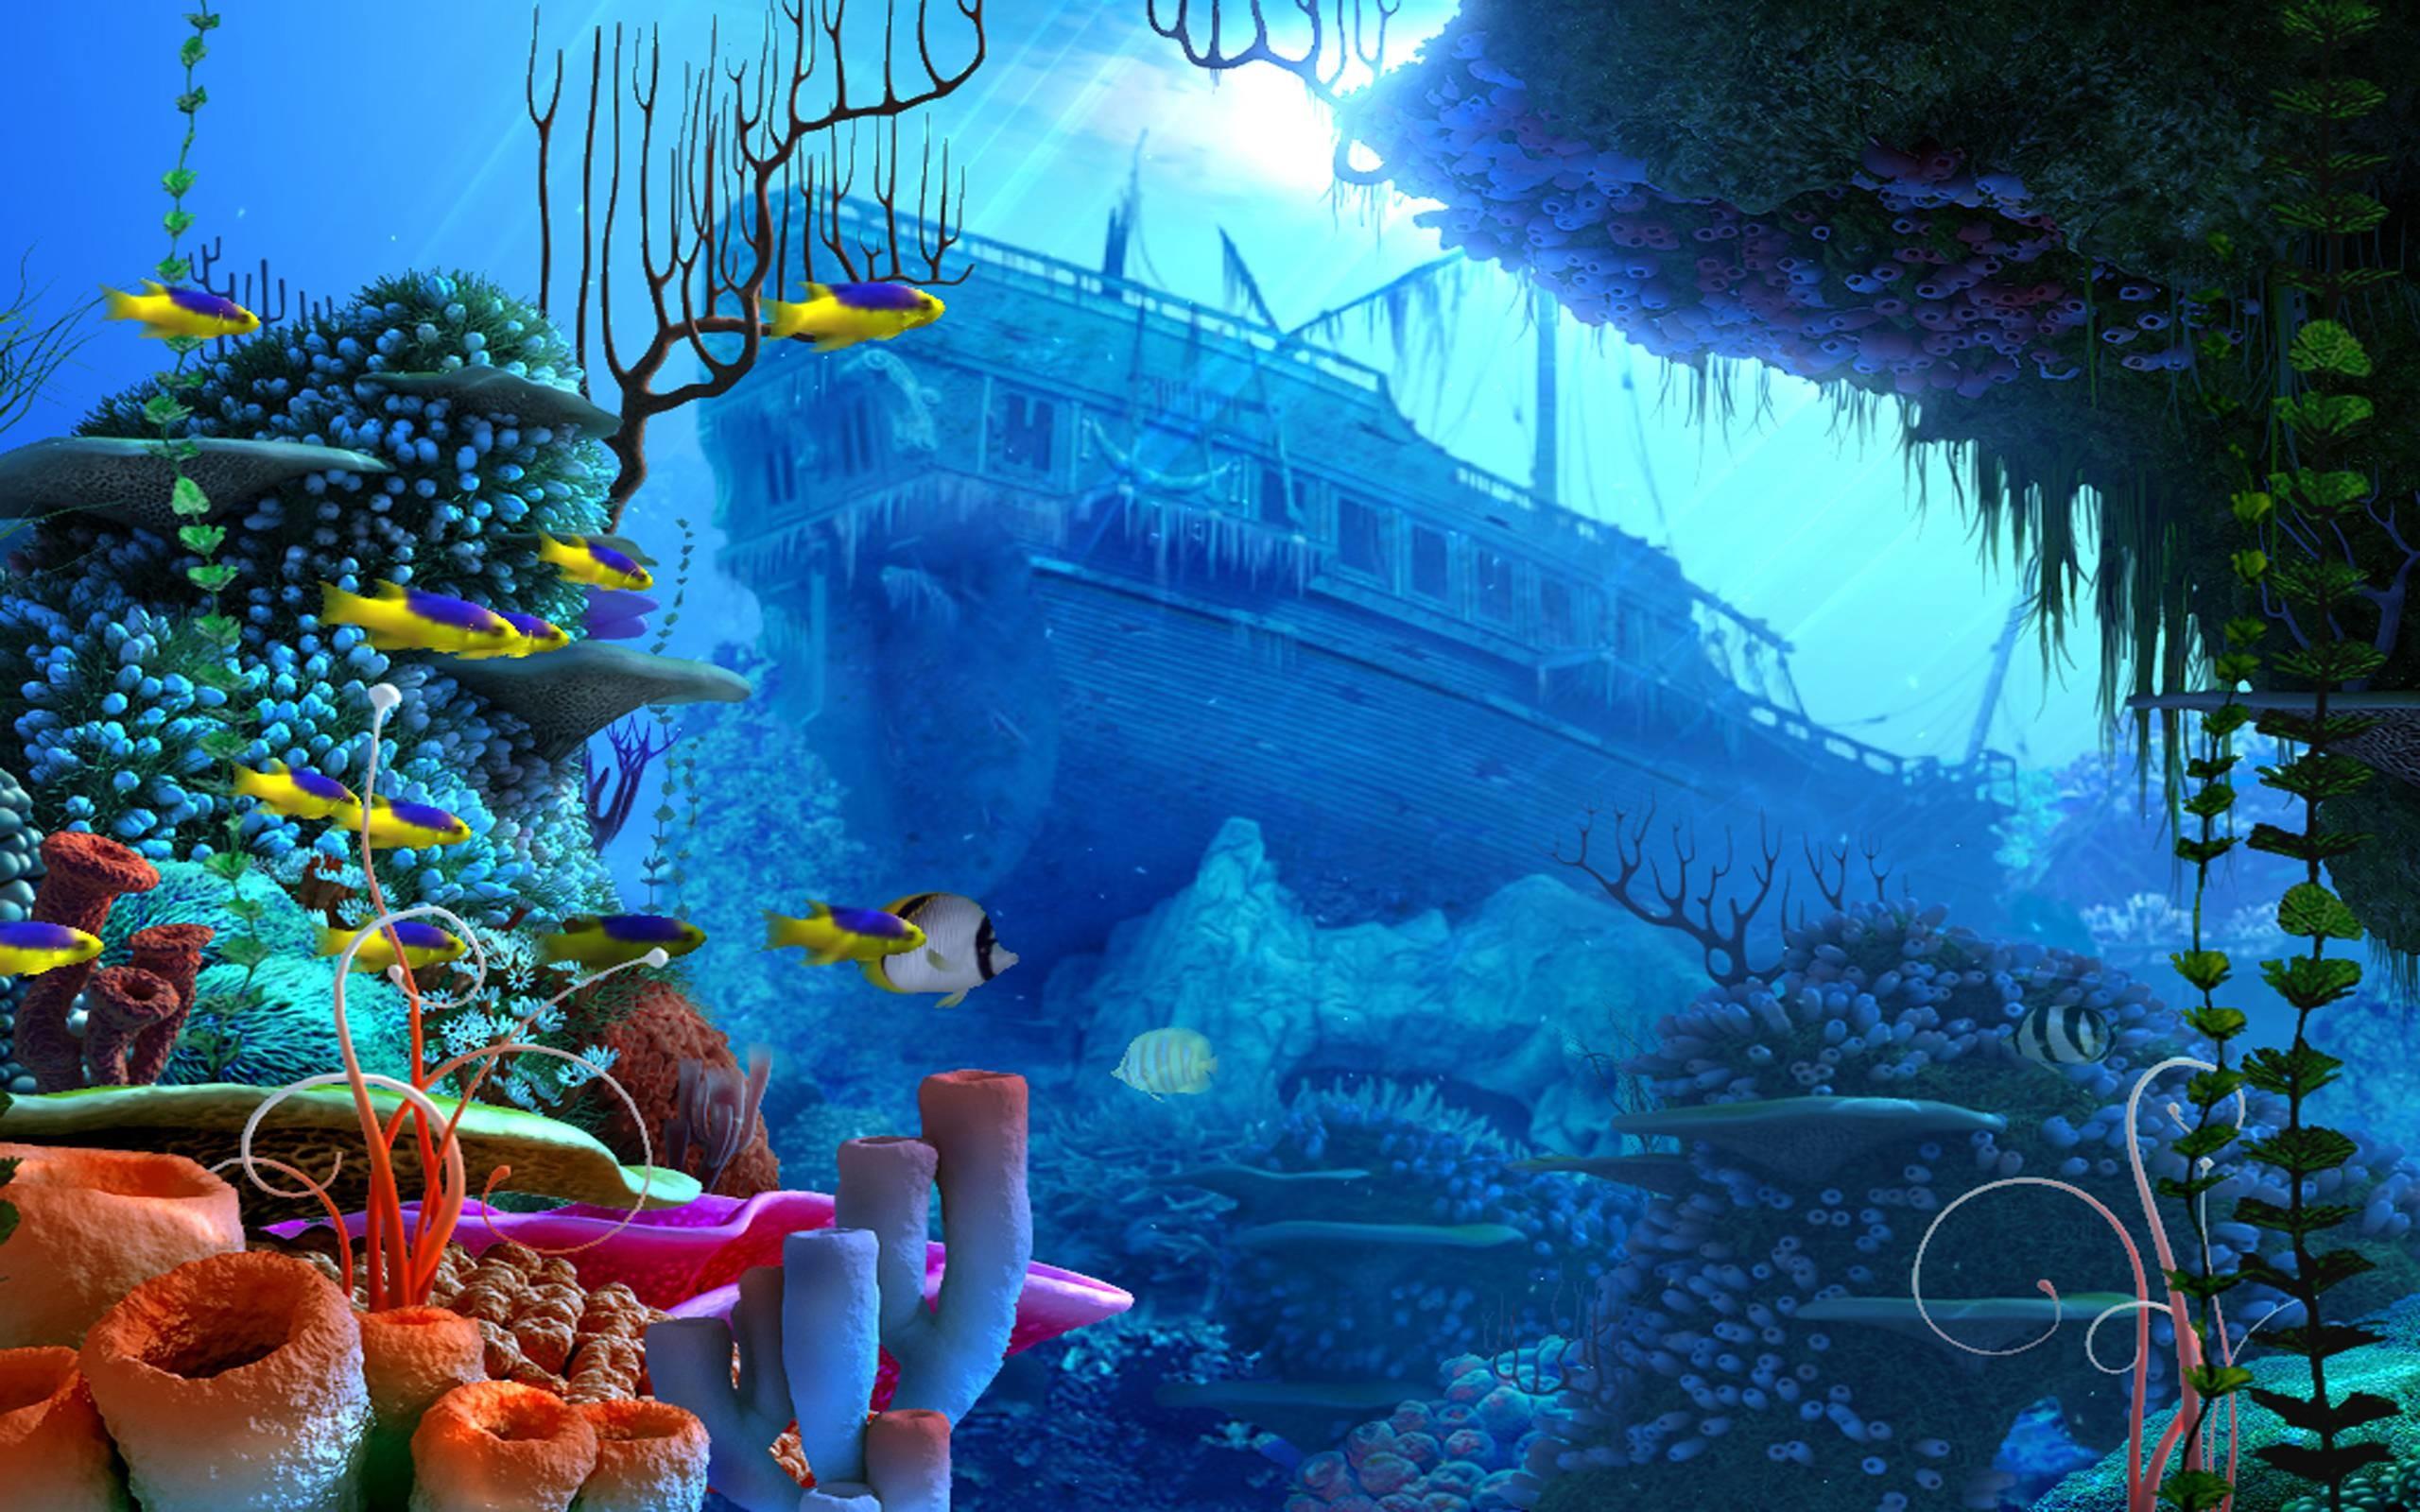 Underwater Wallpapers – Full HD wallpaper search